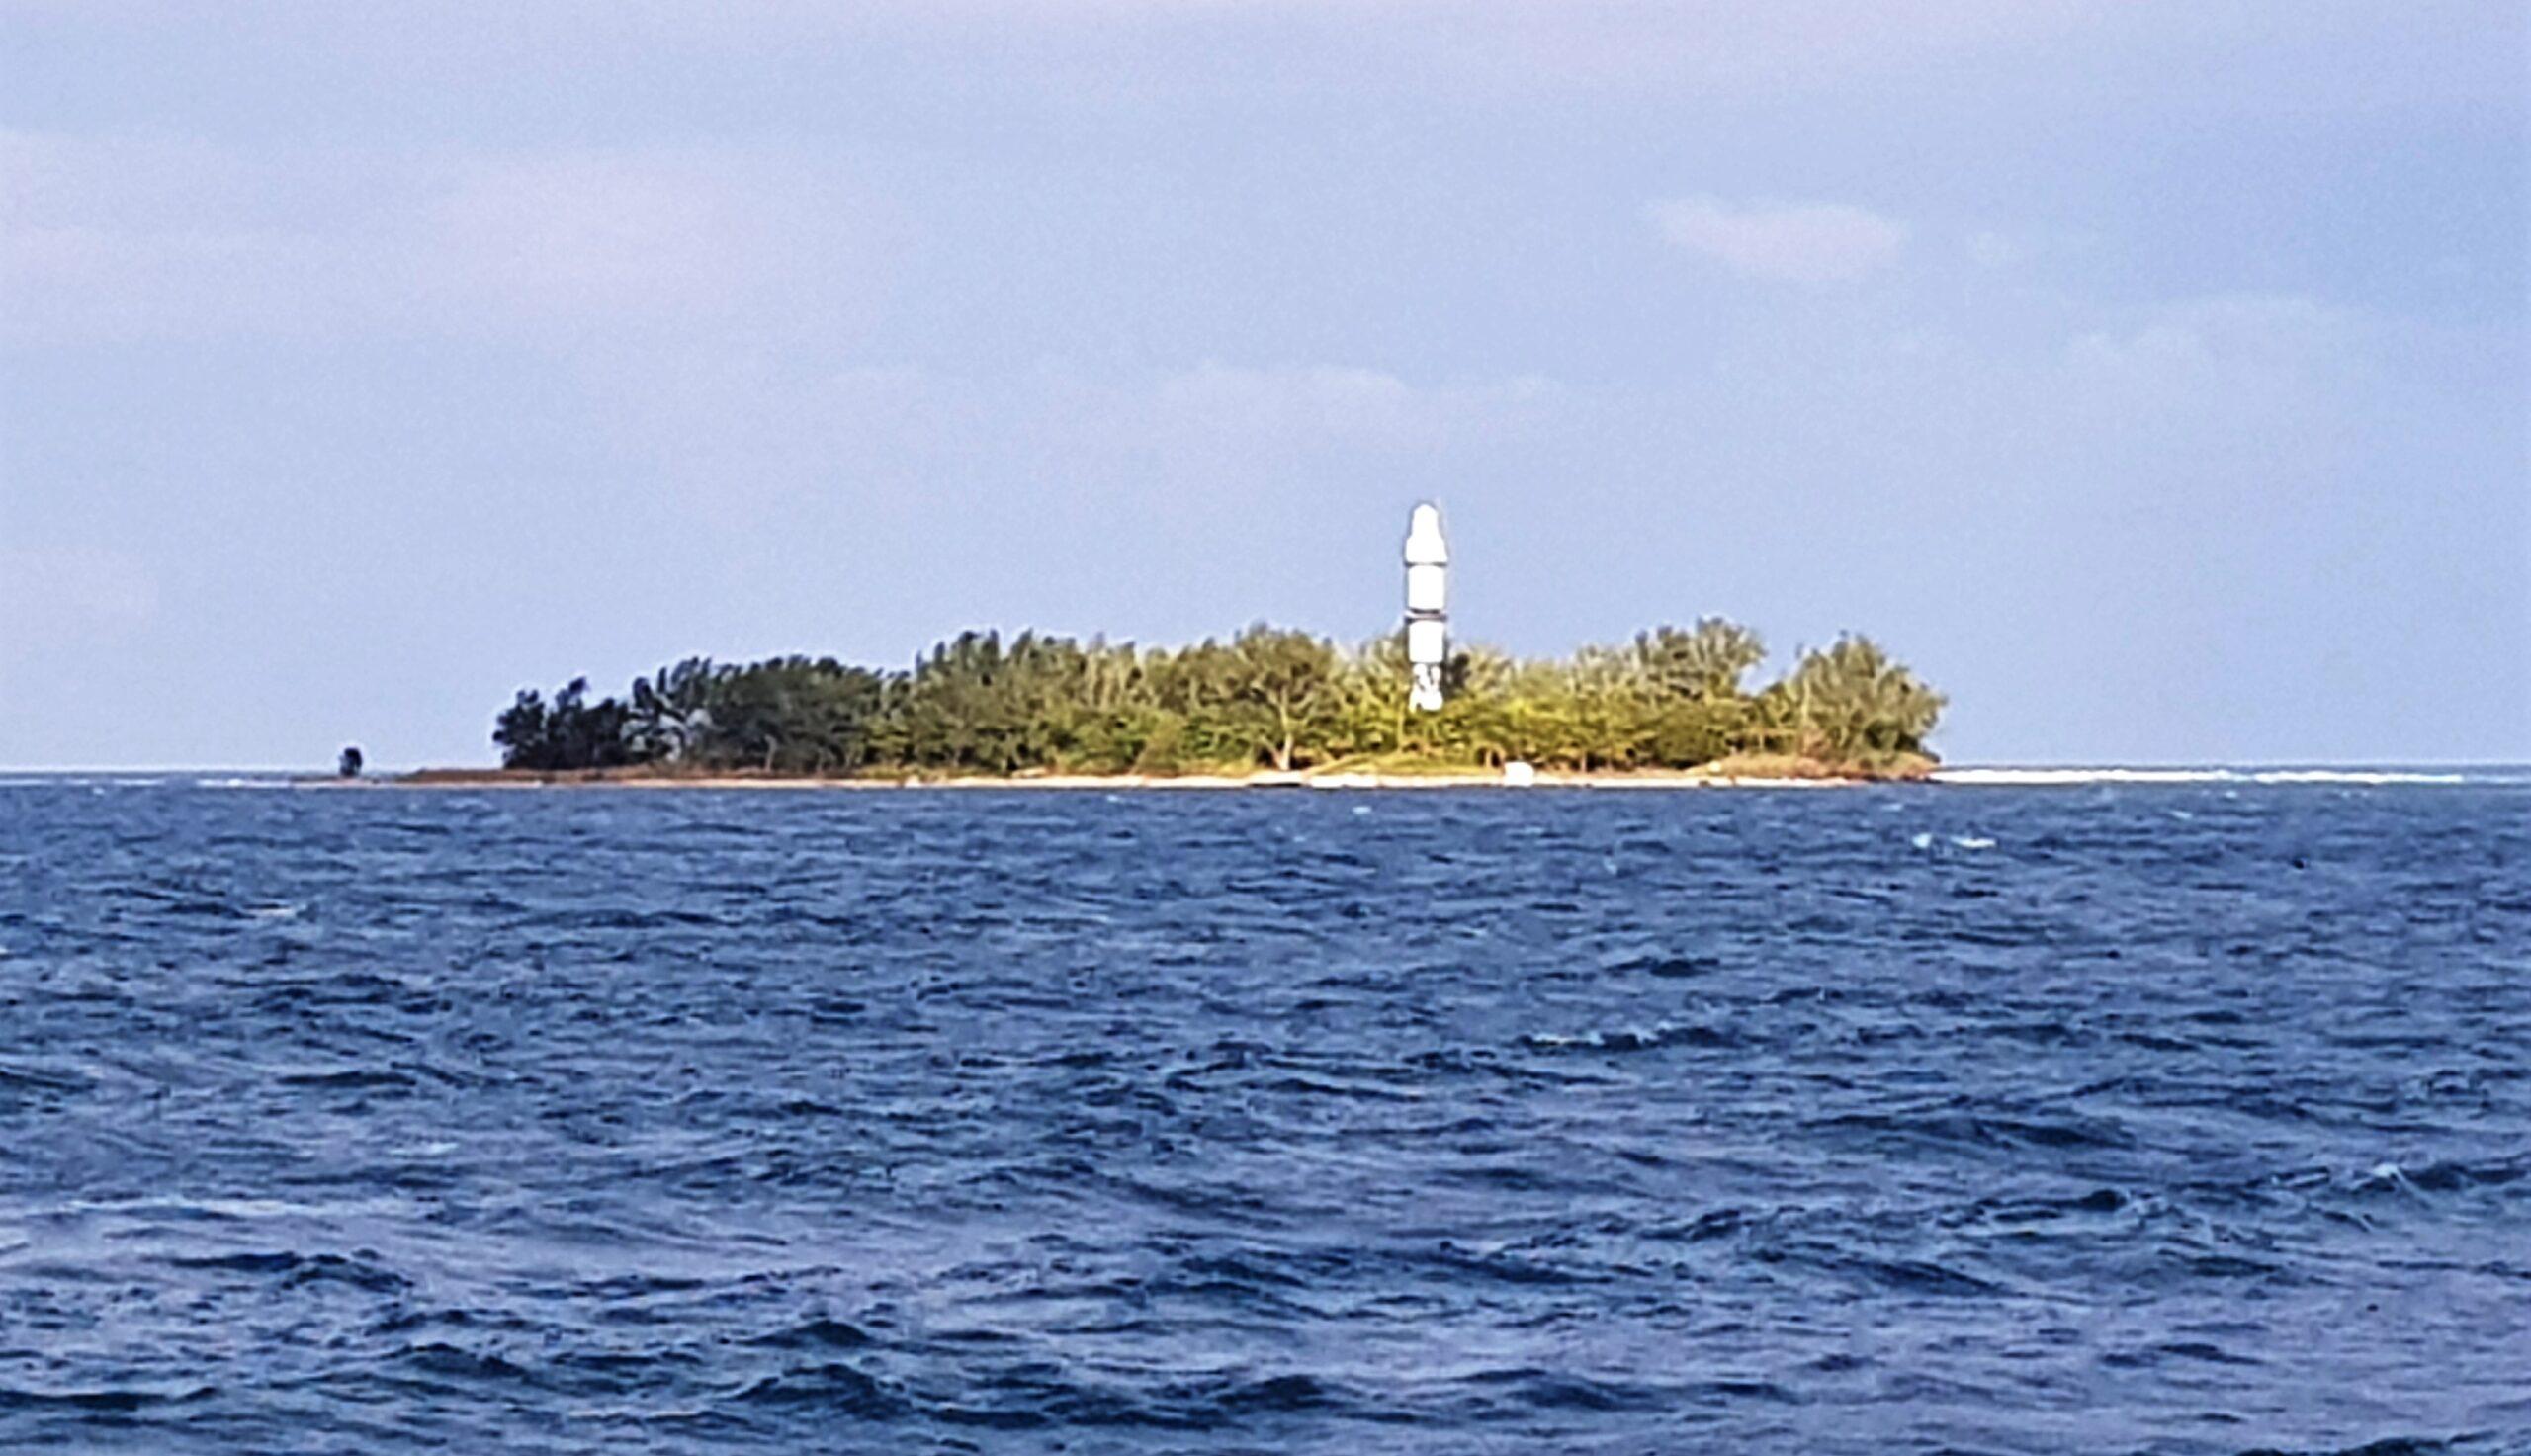 Sacrifice Island: Veracruz's Protected Ecosystem